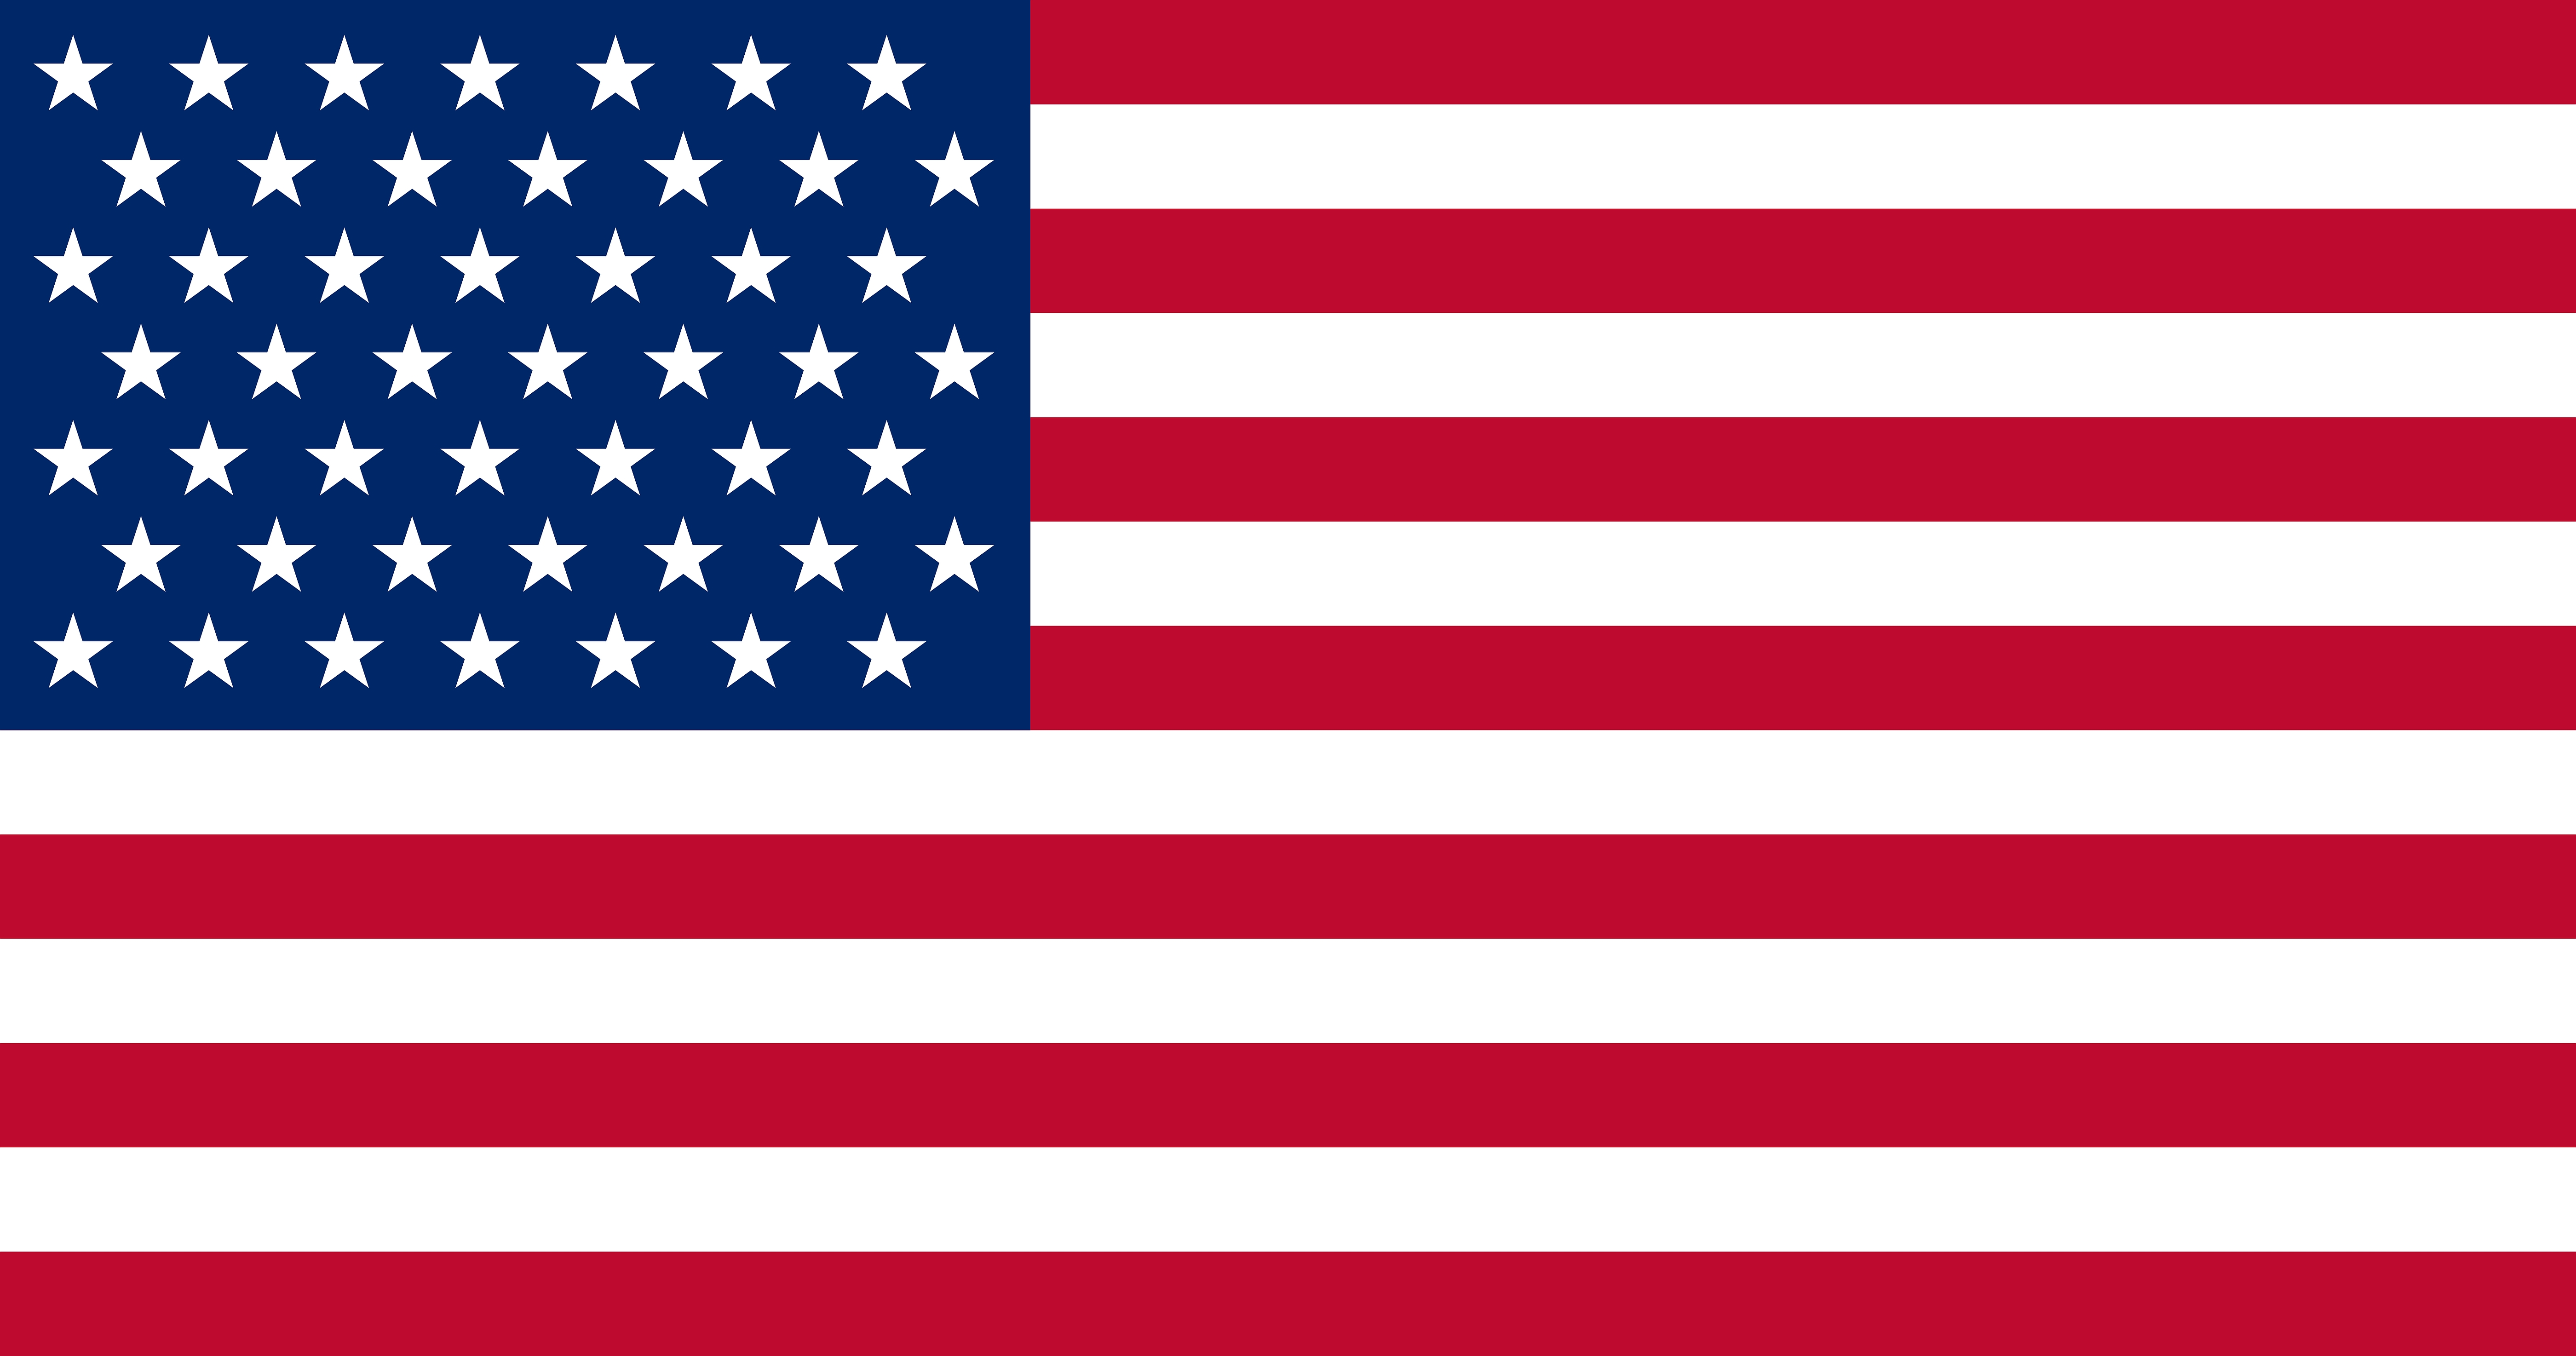 American Flag Wallpaper HD 2016 5600x2948